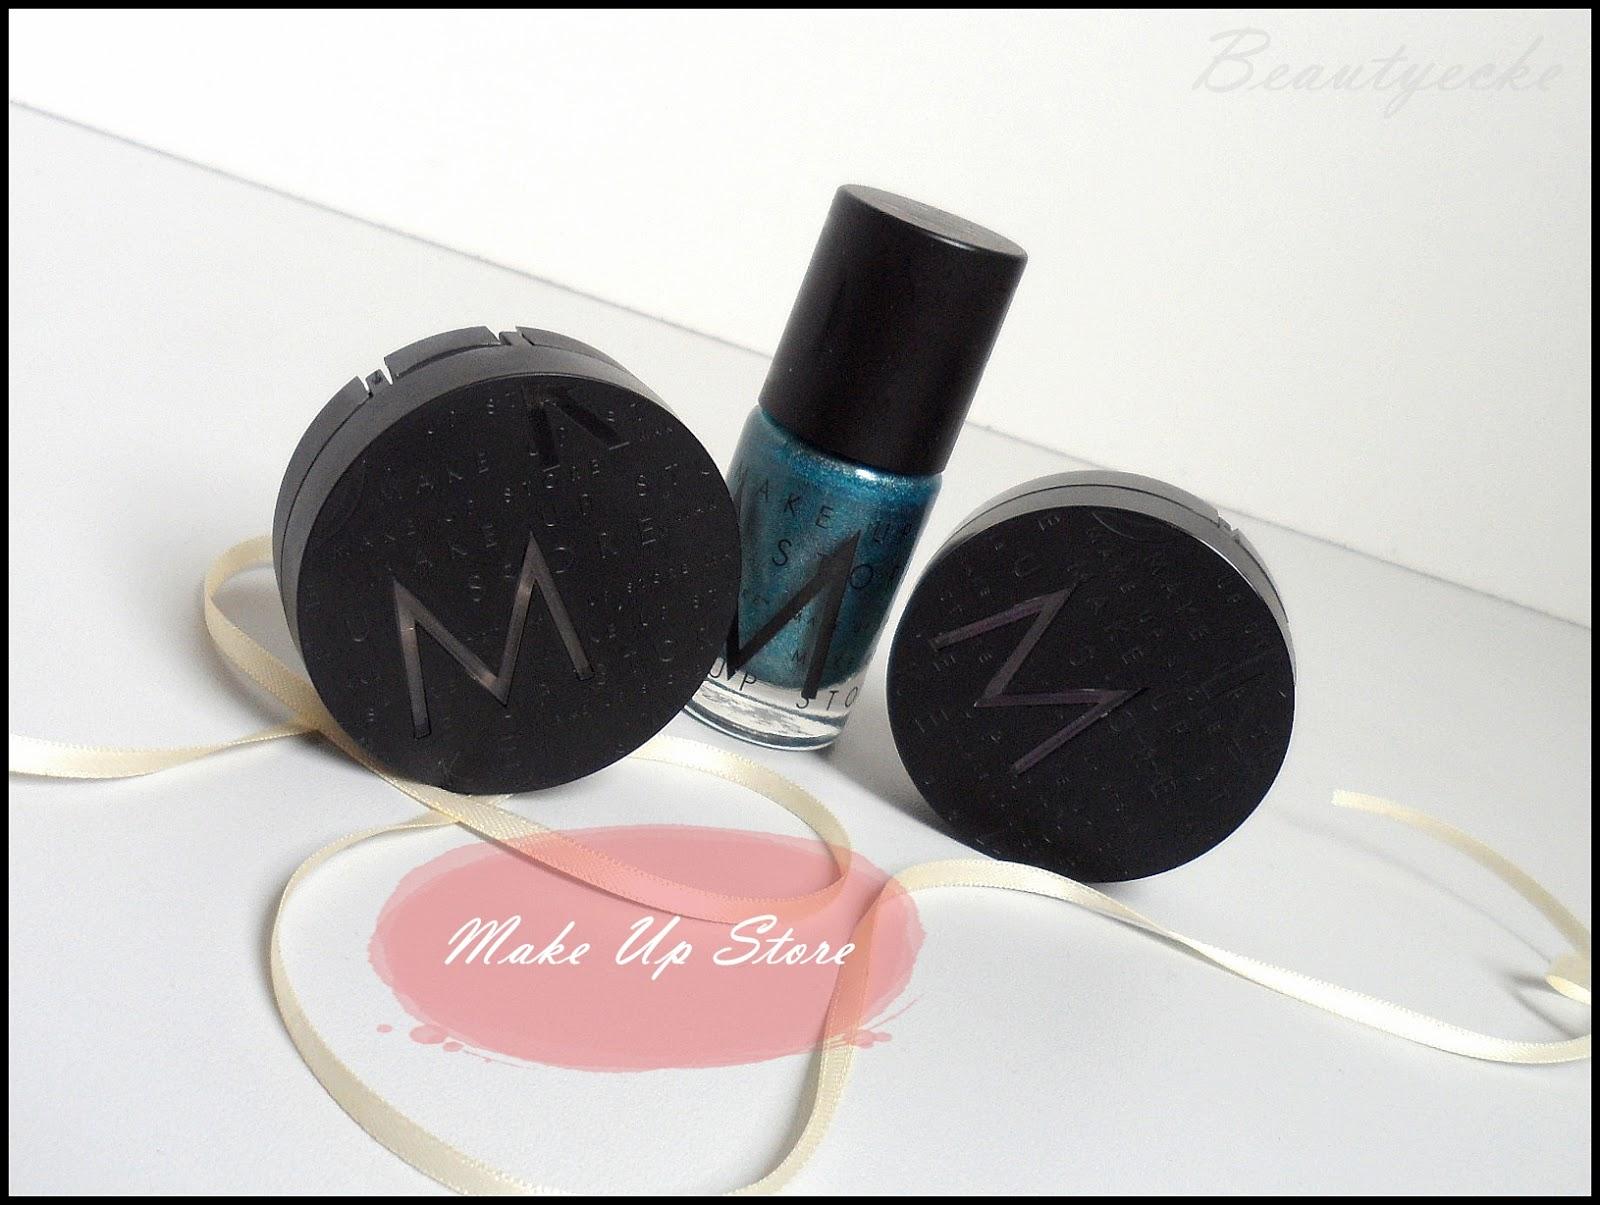 beautyecke make up store berlin eindr cke zur ausbeute. Black Bedroom Furniture Sets. Home Design Ideas